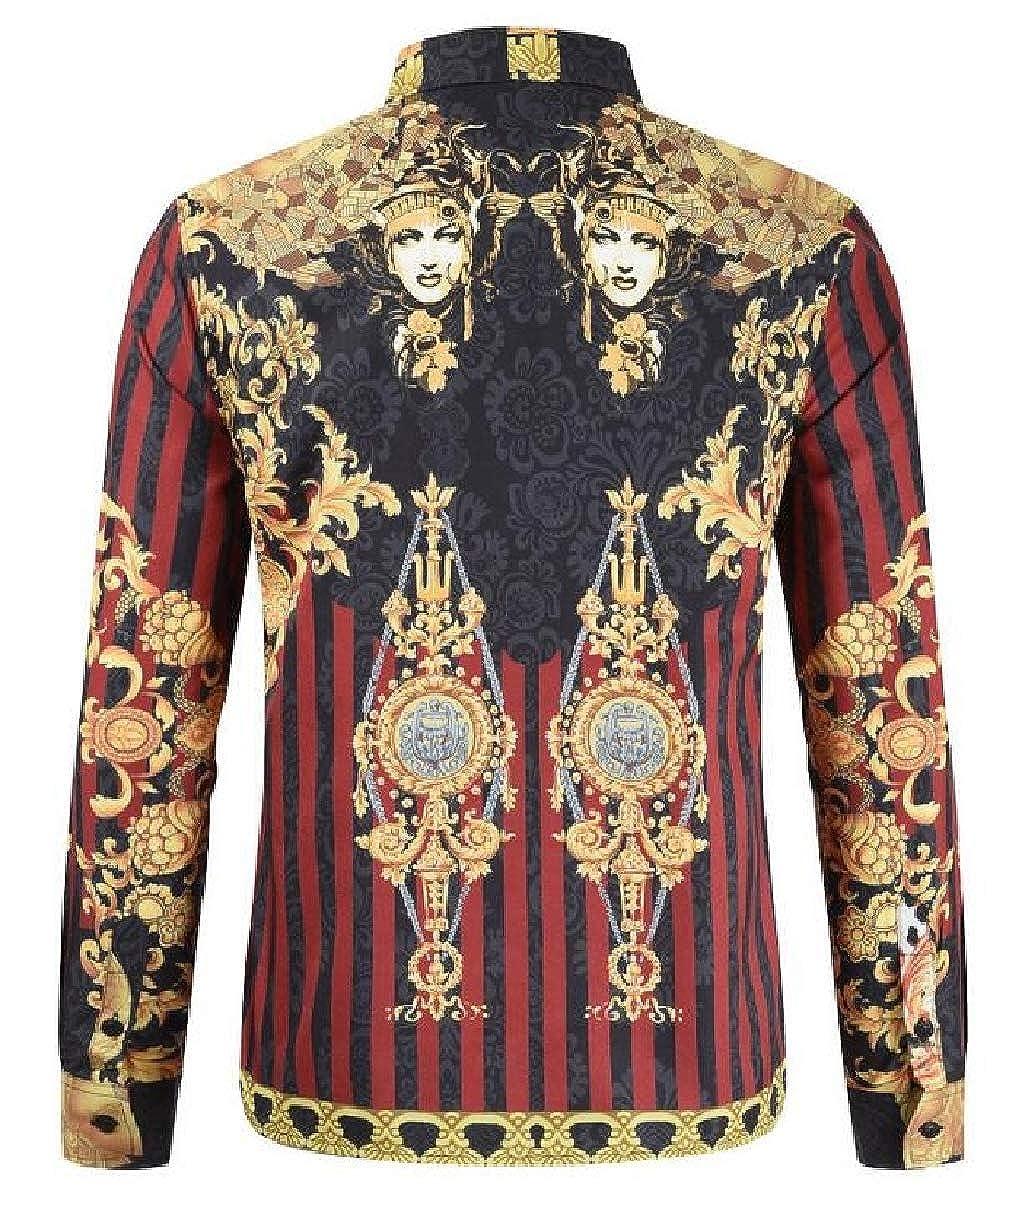 Xswsy XG Mens Classic Slim Luxury Printed Long-Sleeve Button-Down Dress Shirt